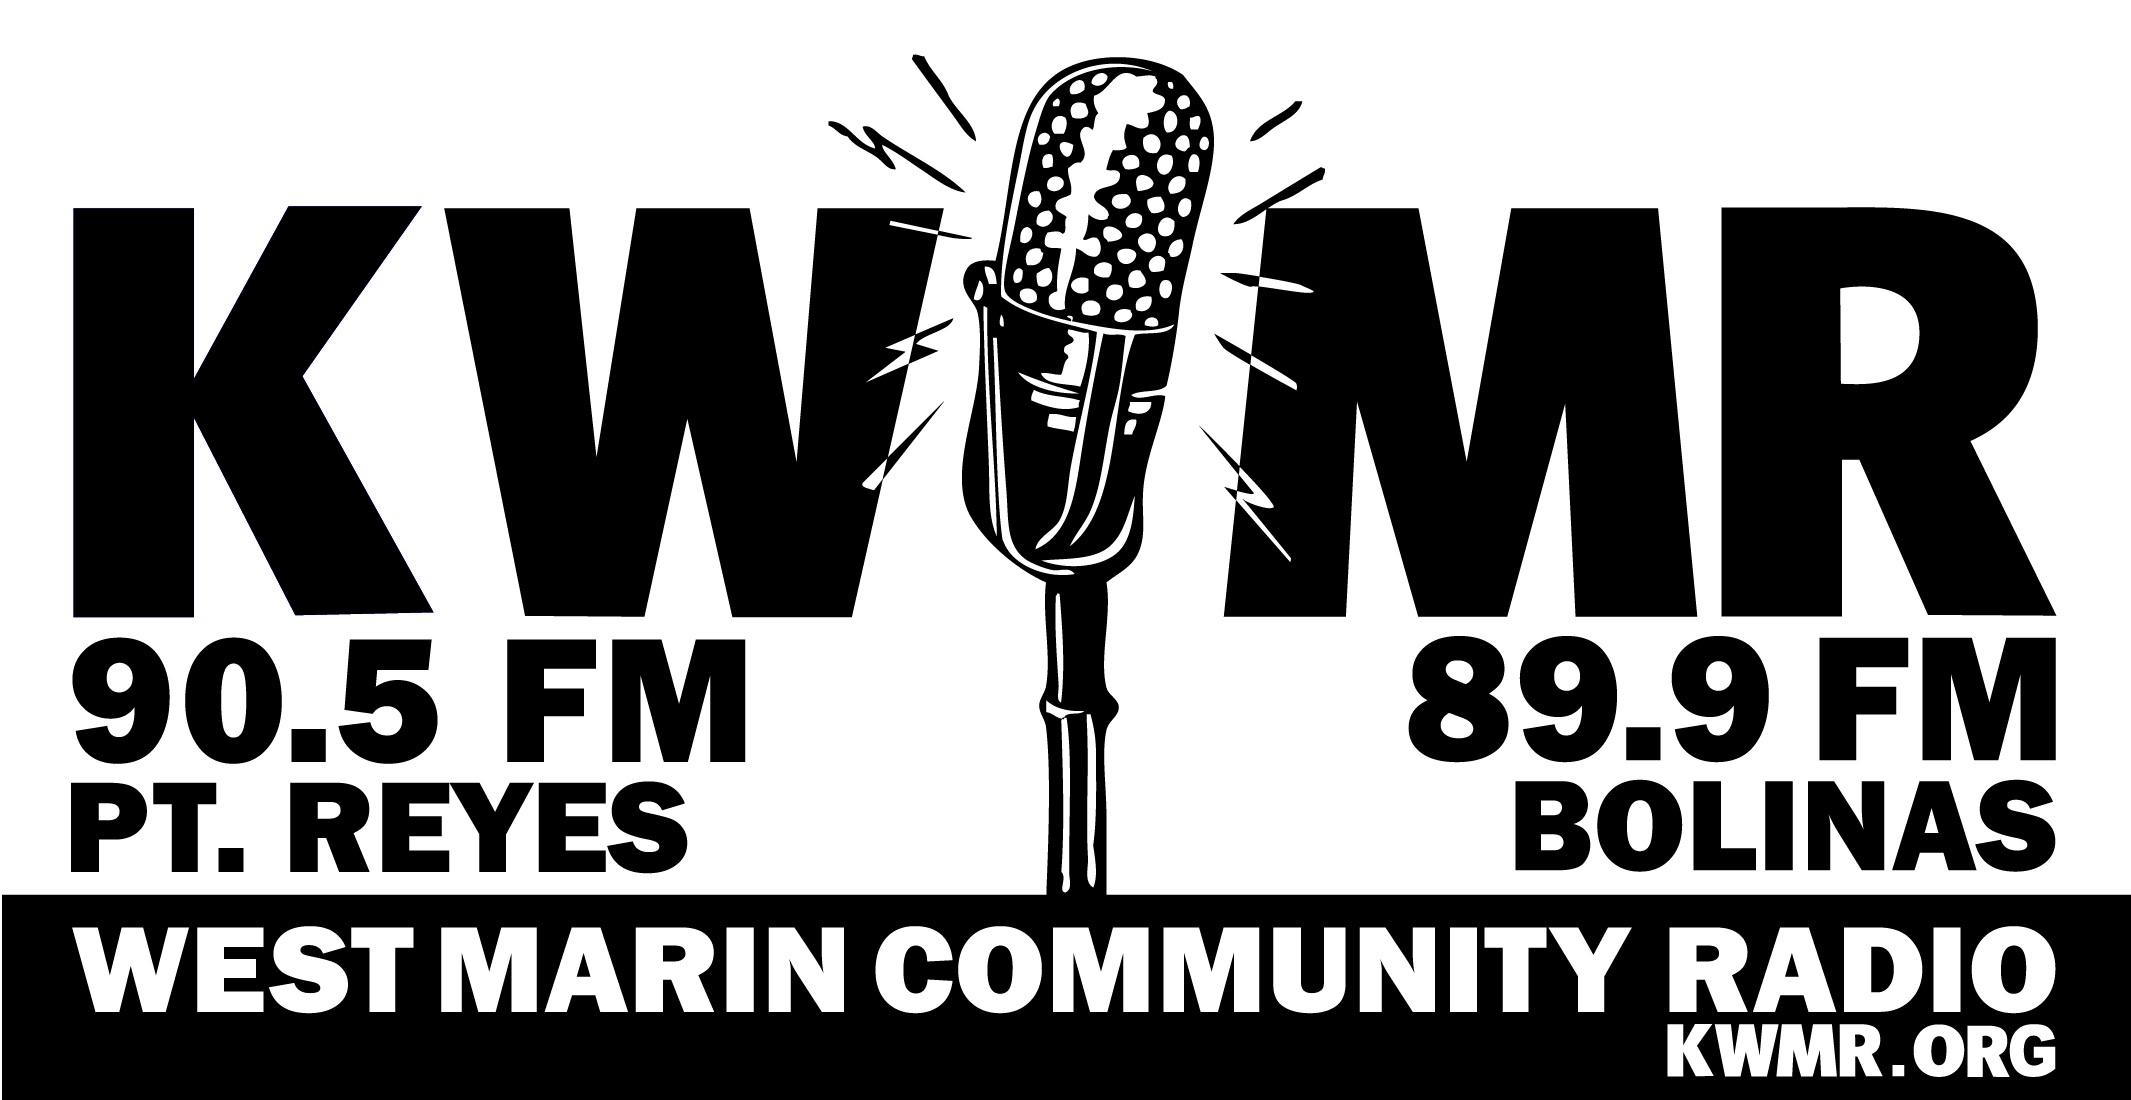 KWMR, West Marin Community Radio